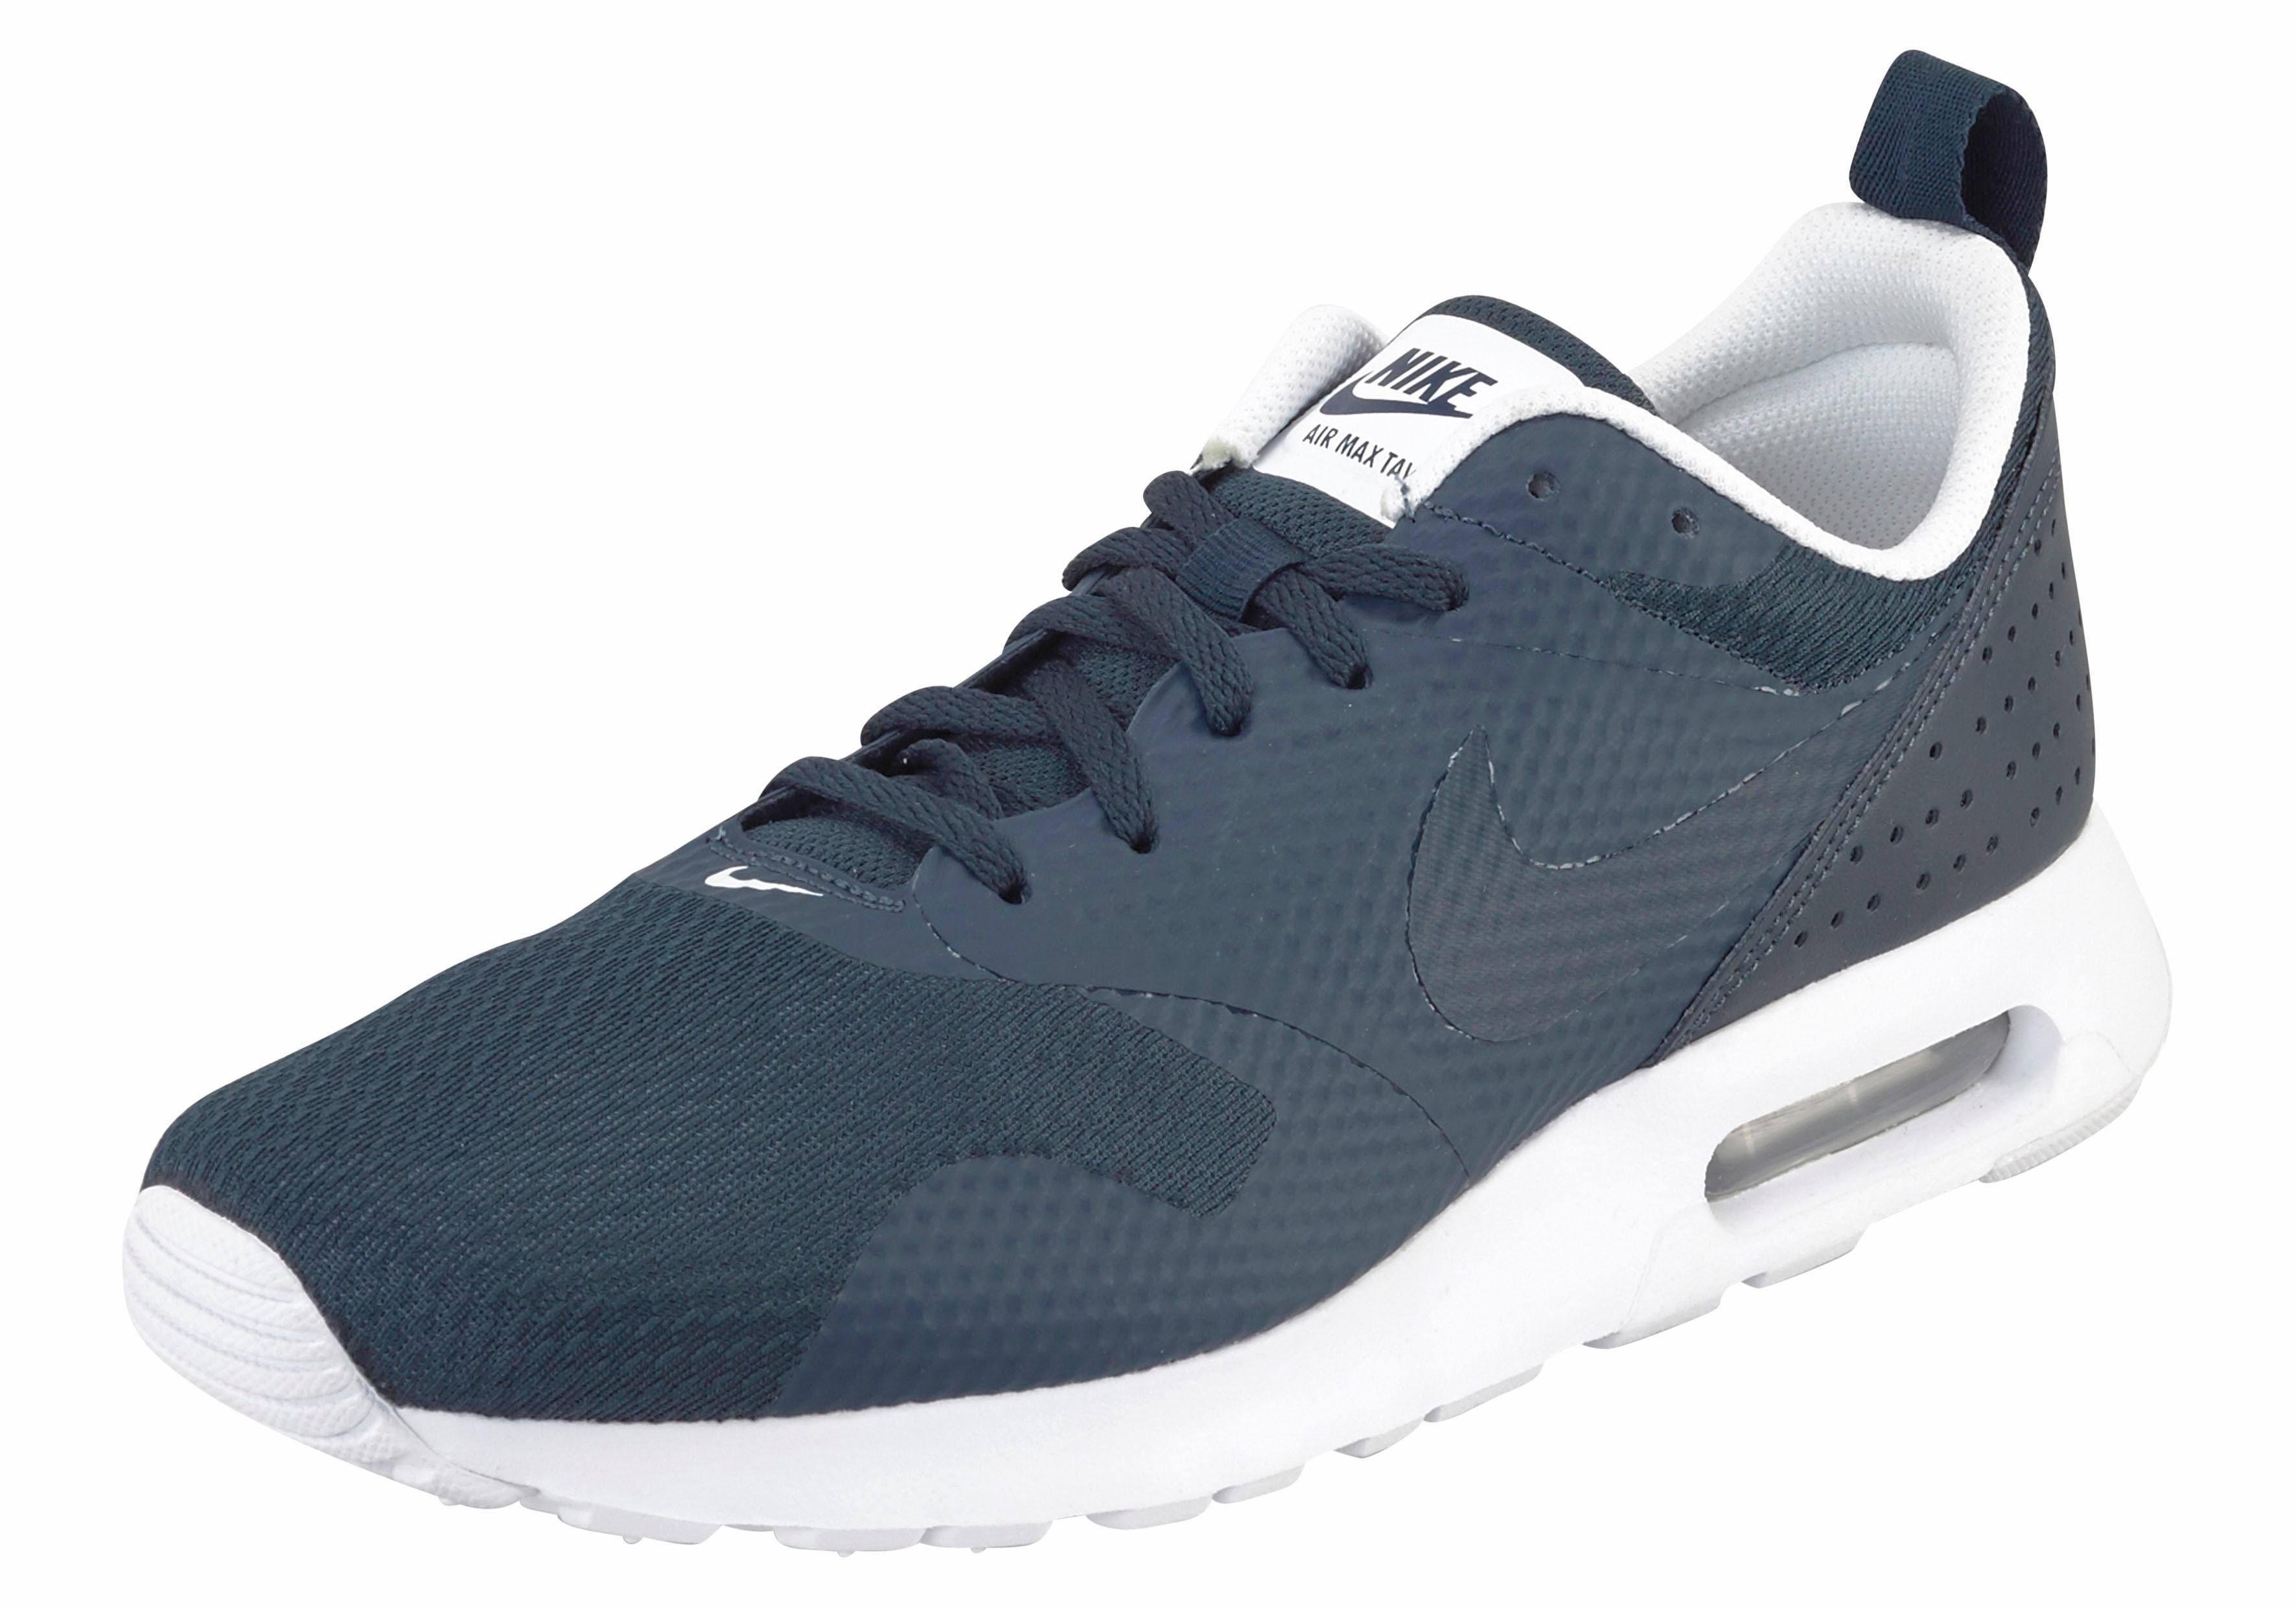 Max Herren Air Größe Nike Tavas Sneaker Schuhe 41 Navy Dunkelblau 14qw5xU